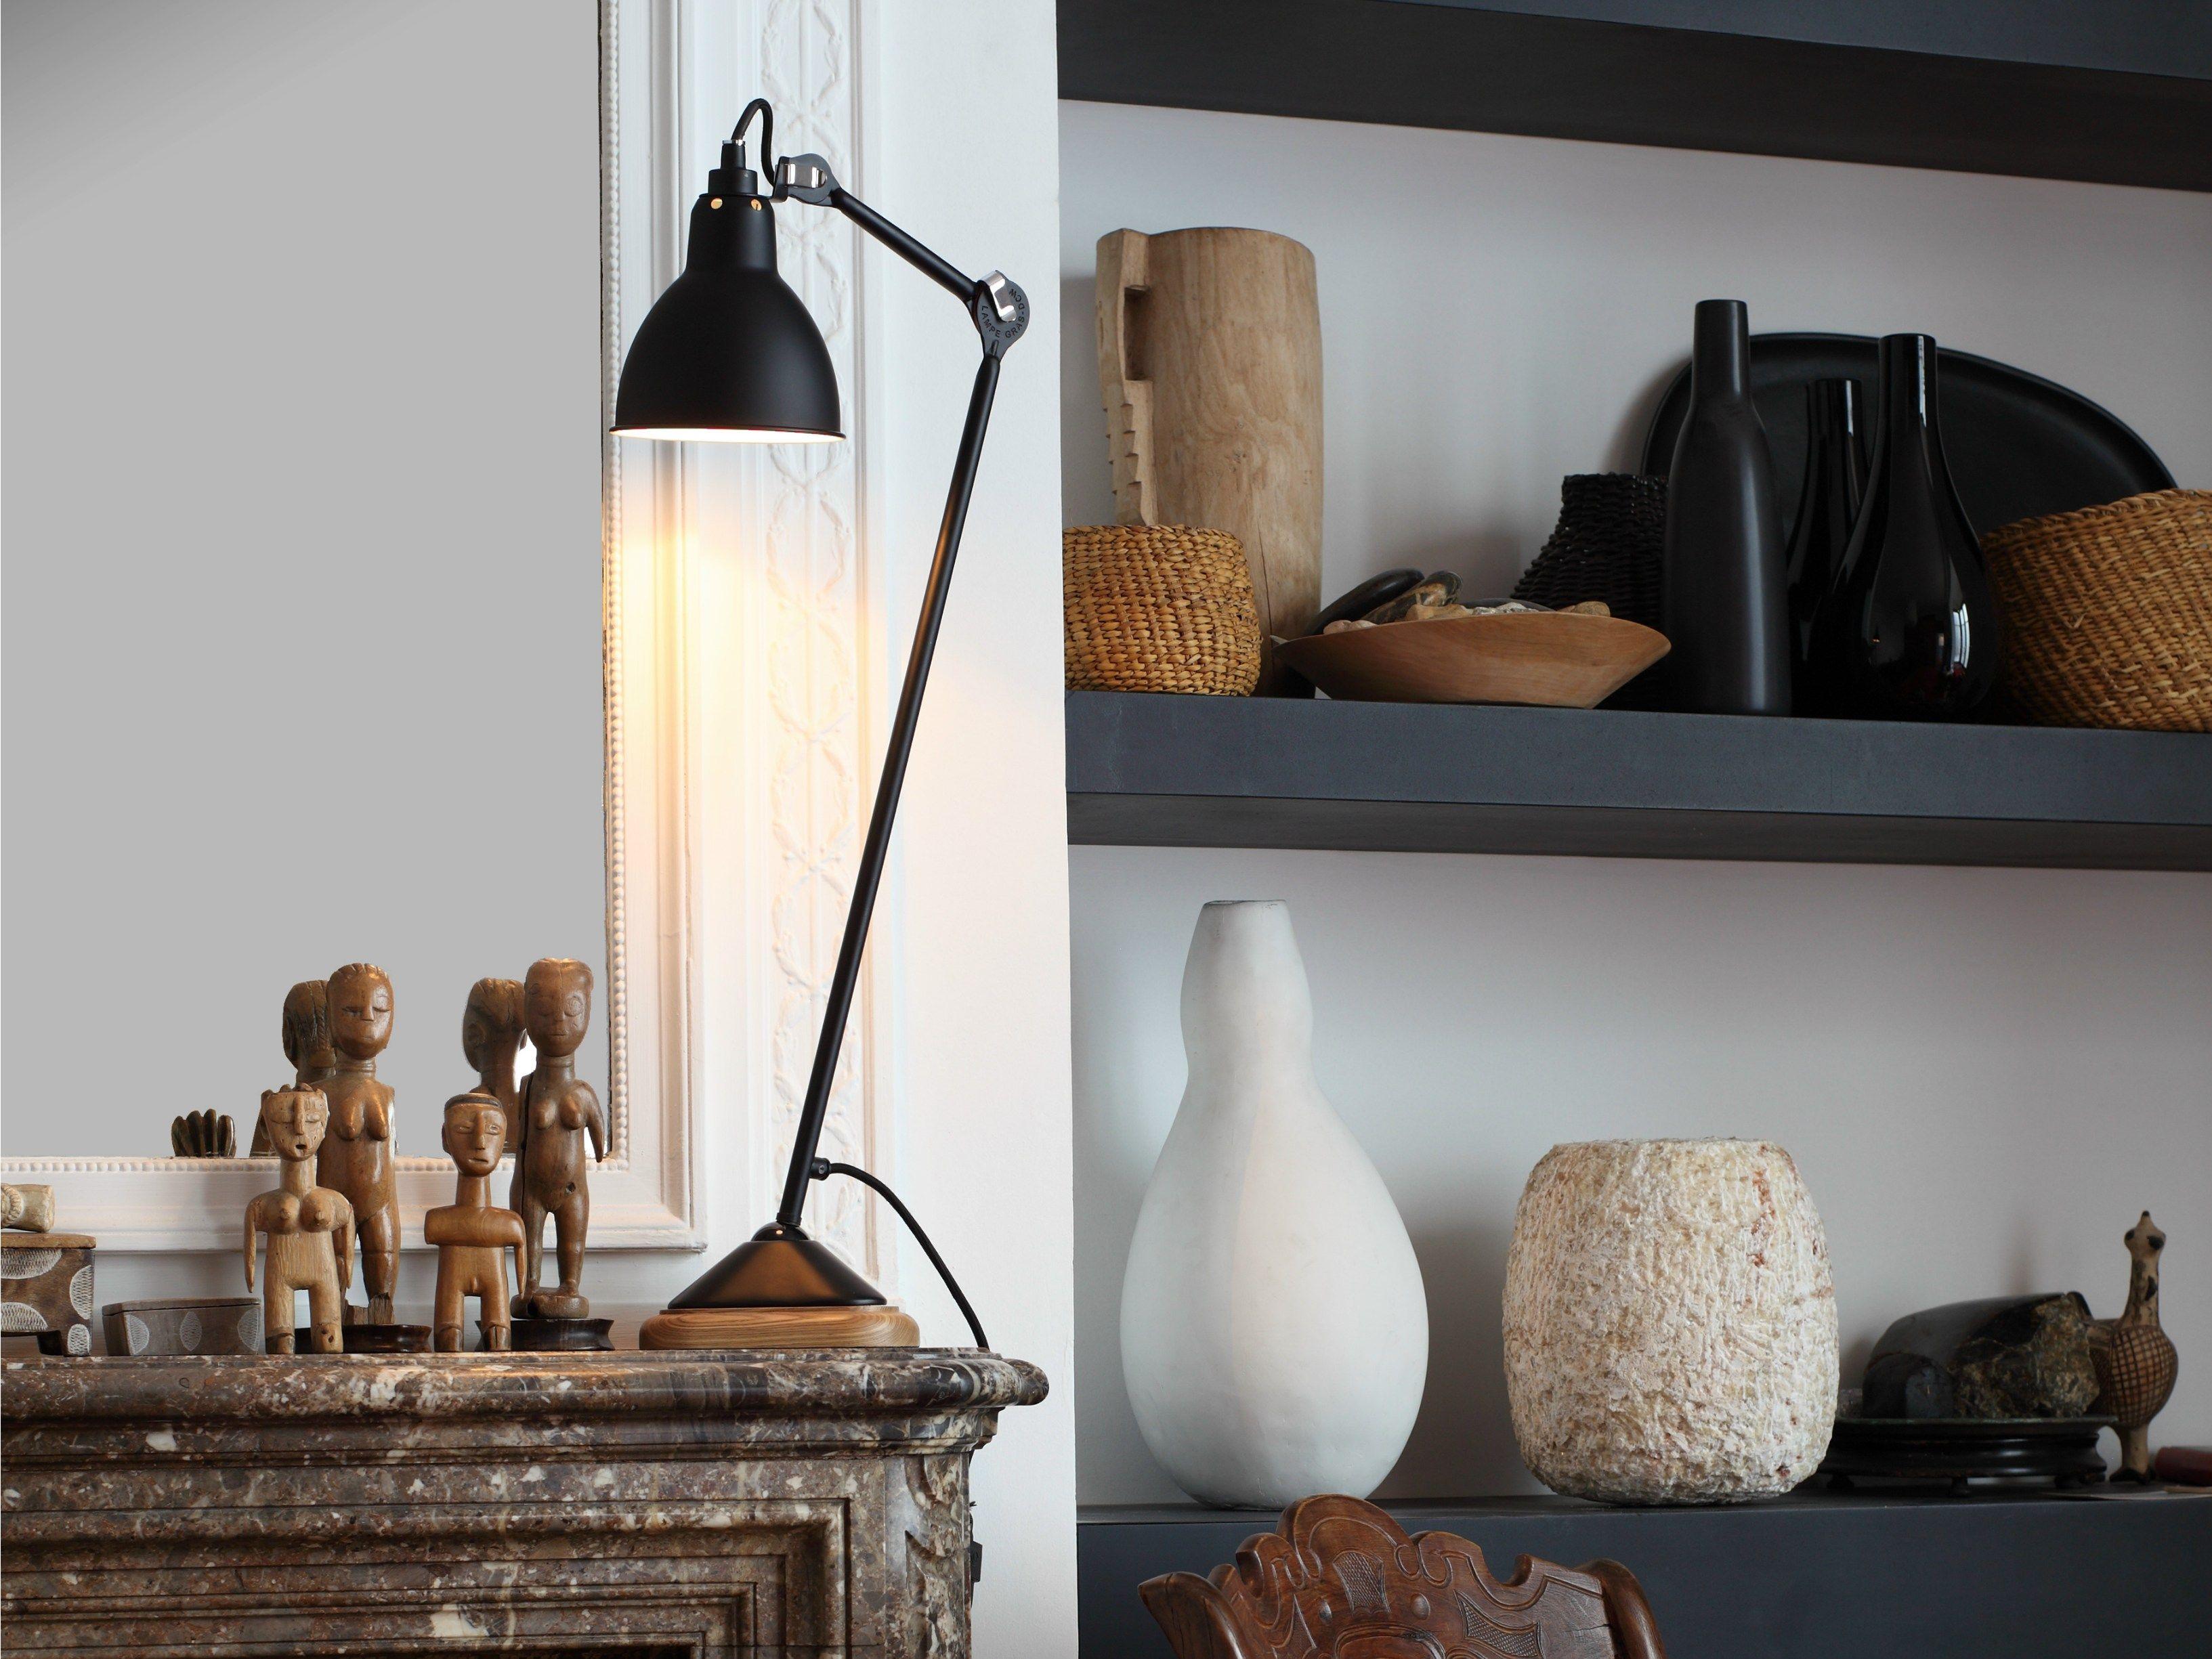 N 206 lampada da tavolo by dcw ditions - Dcw edities ...